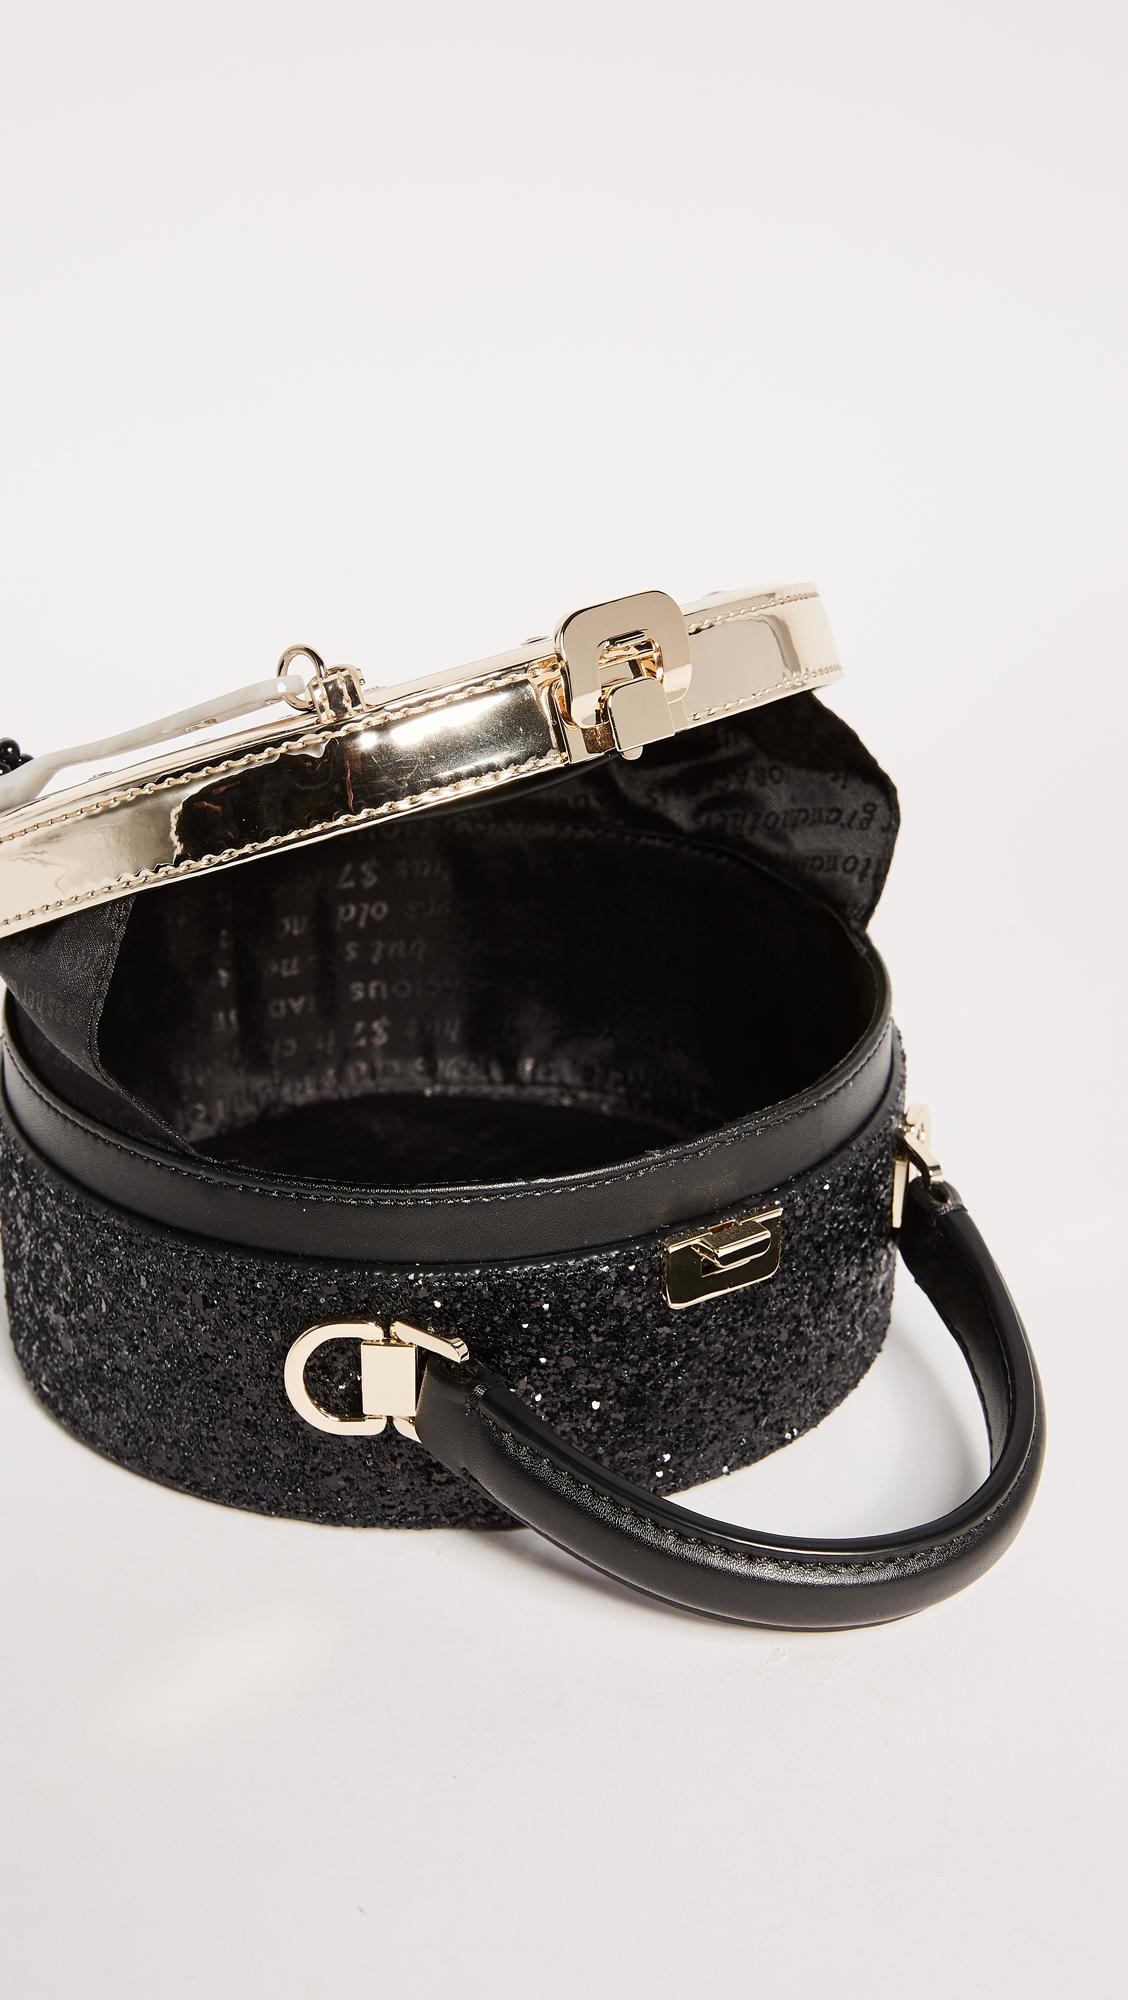 42aa13aa7e35 Kate Spade New York Finer Things Caviar Bag   SHOPBOP